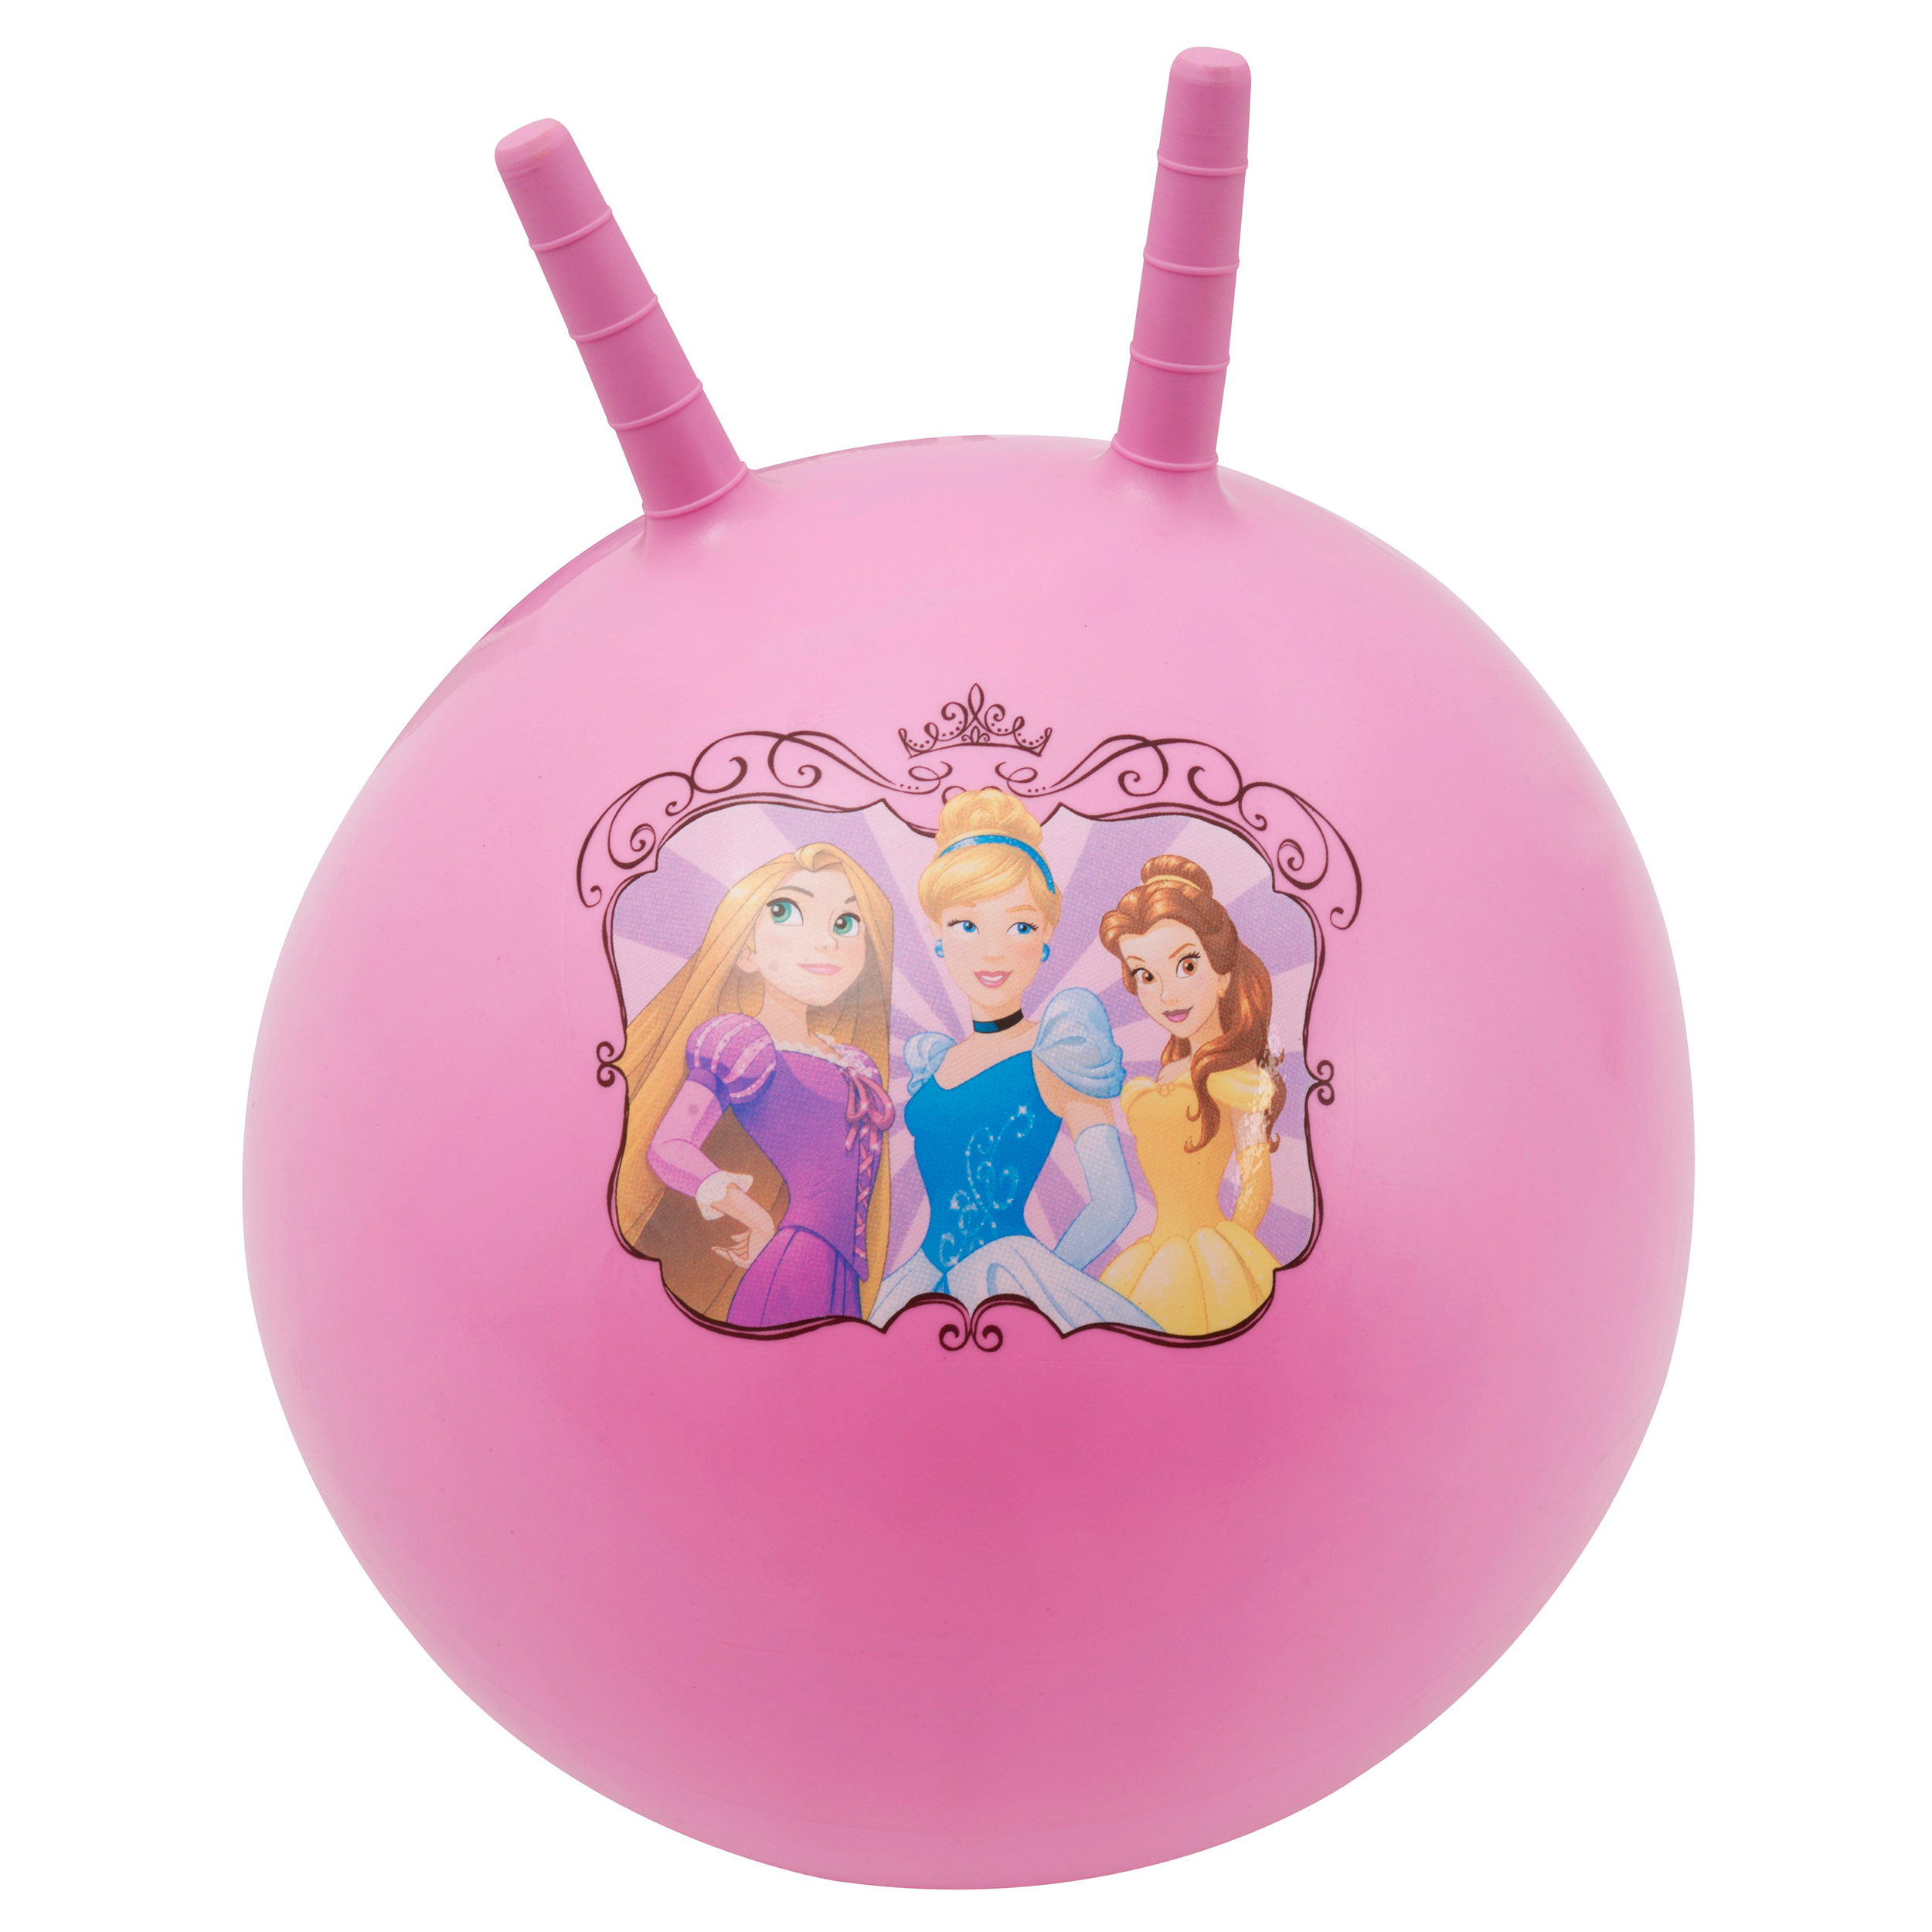 Minge cu manere - Disney Princess